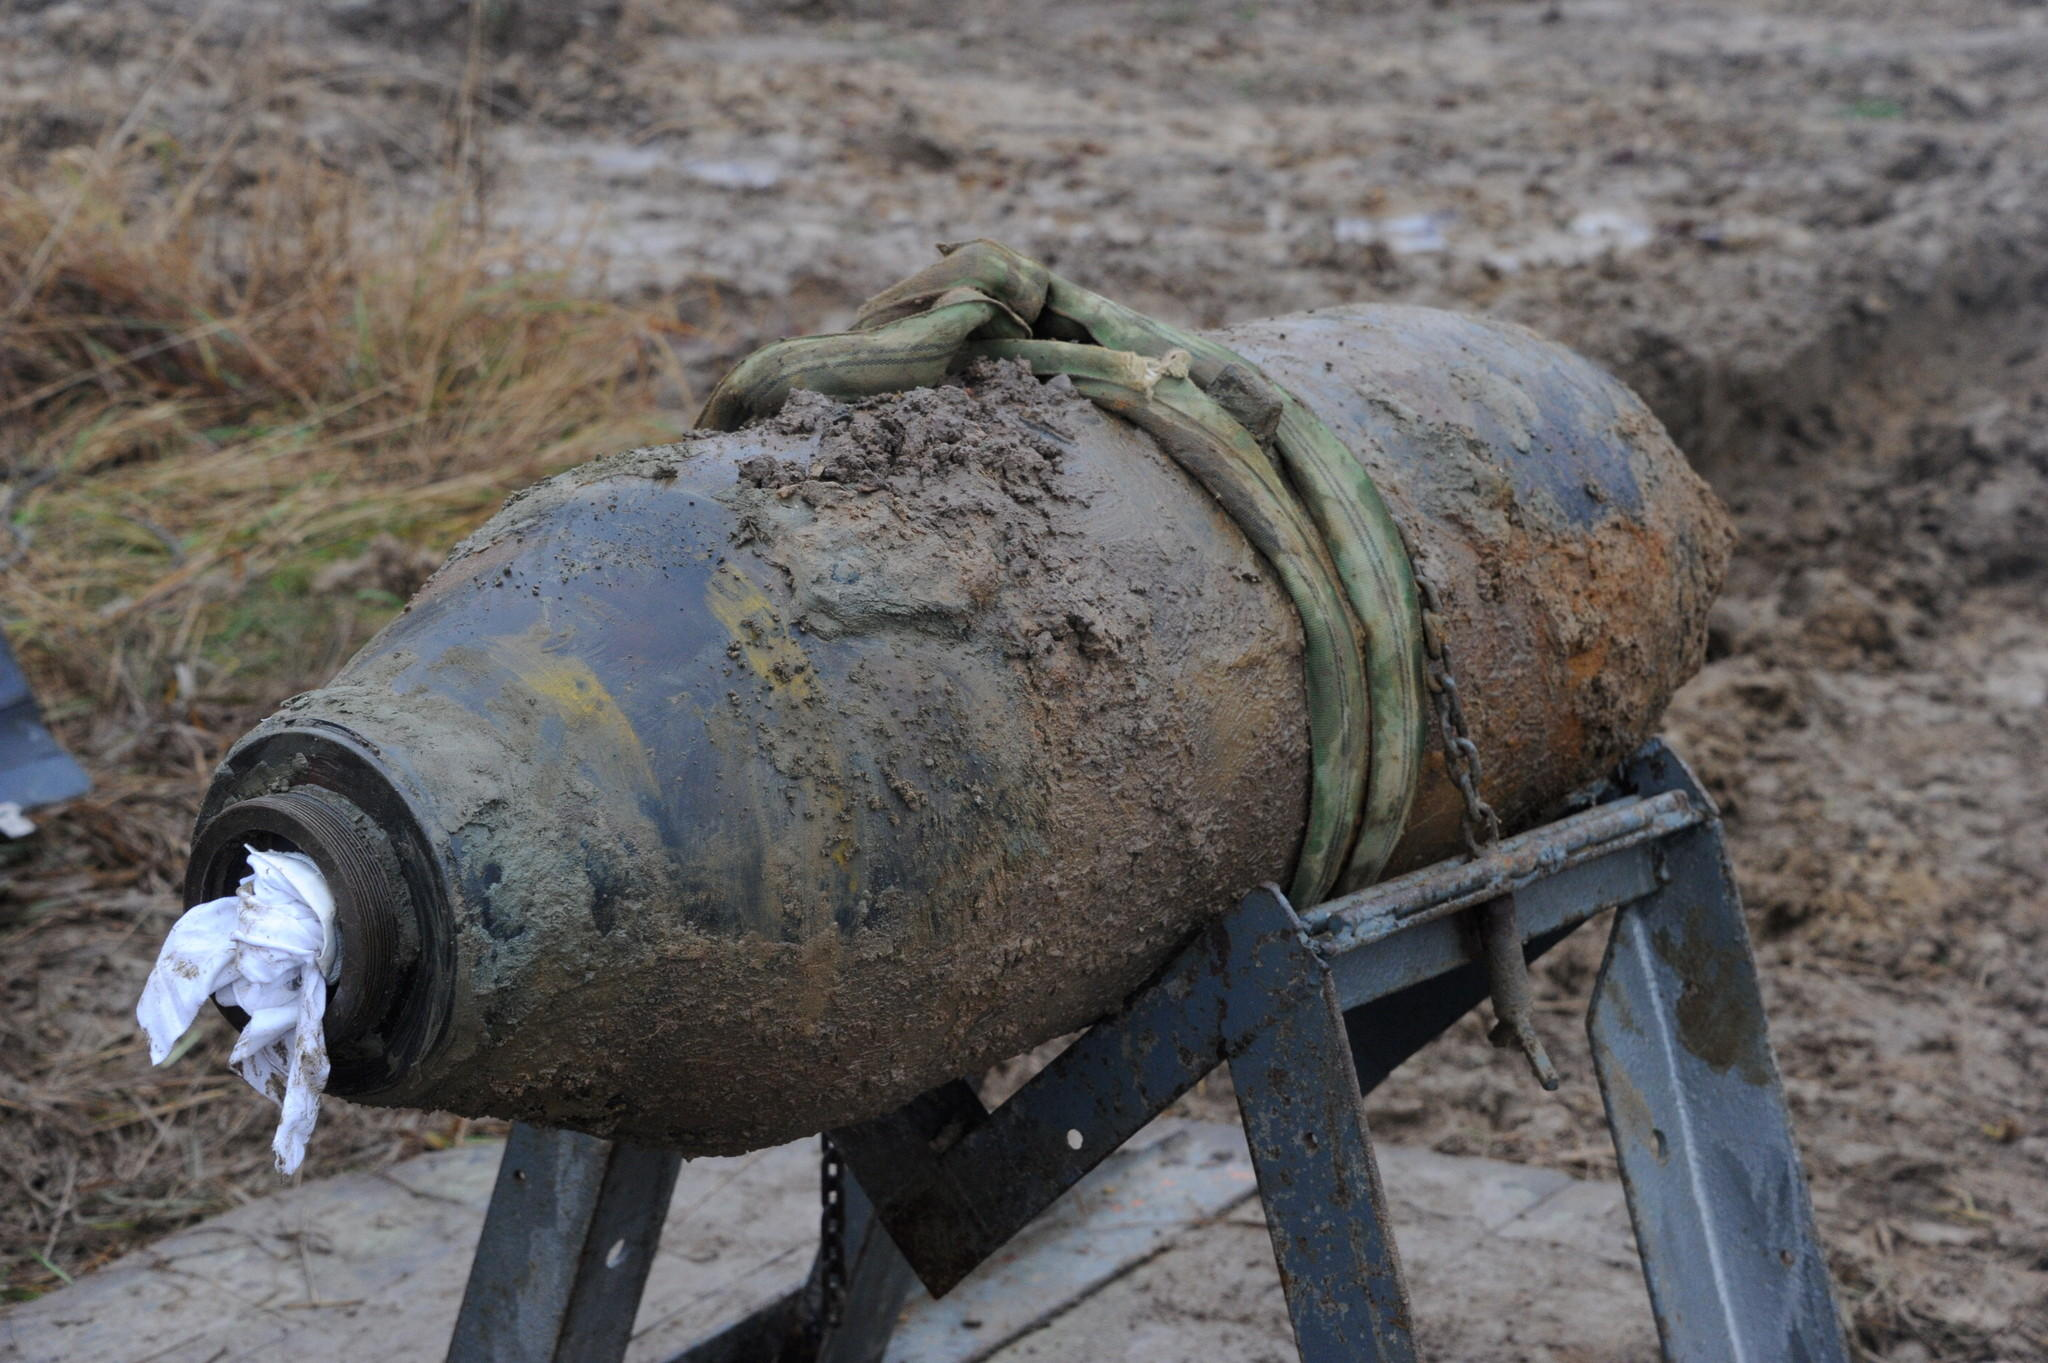 bomba_americana_ii_guerra_mundial_en_alemania.jpg